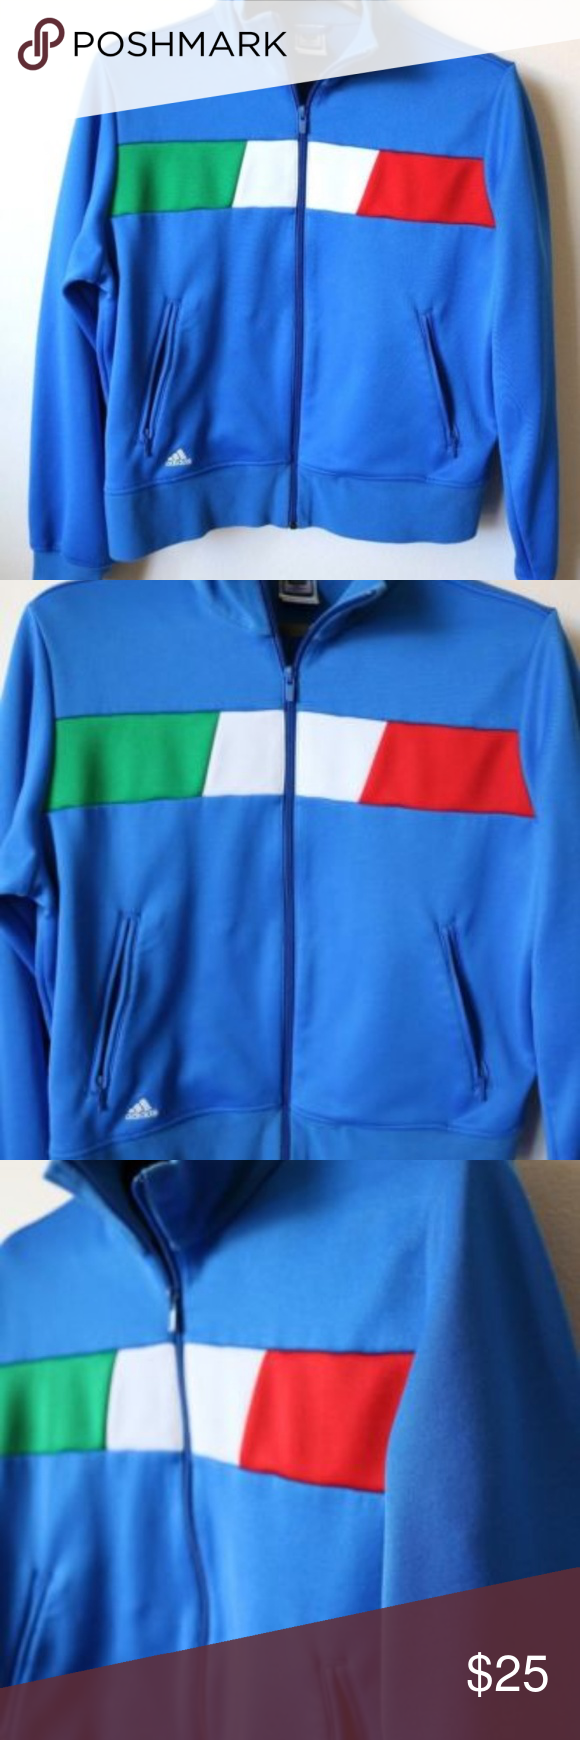 Adidas Italy World Cup Zip Up Track Jacket Adidas Italia